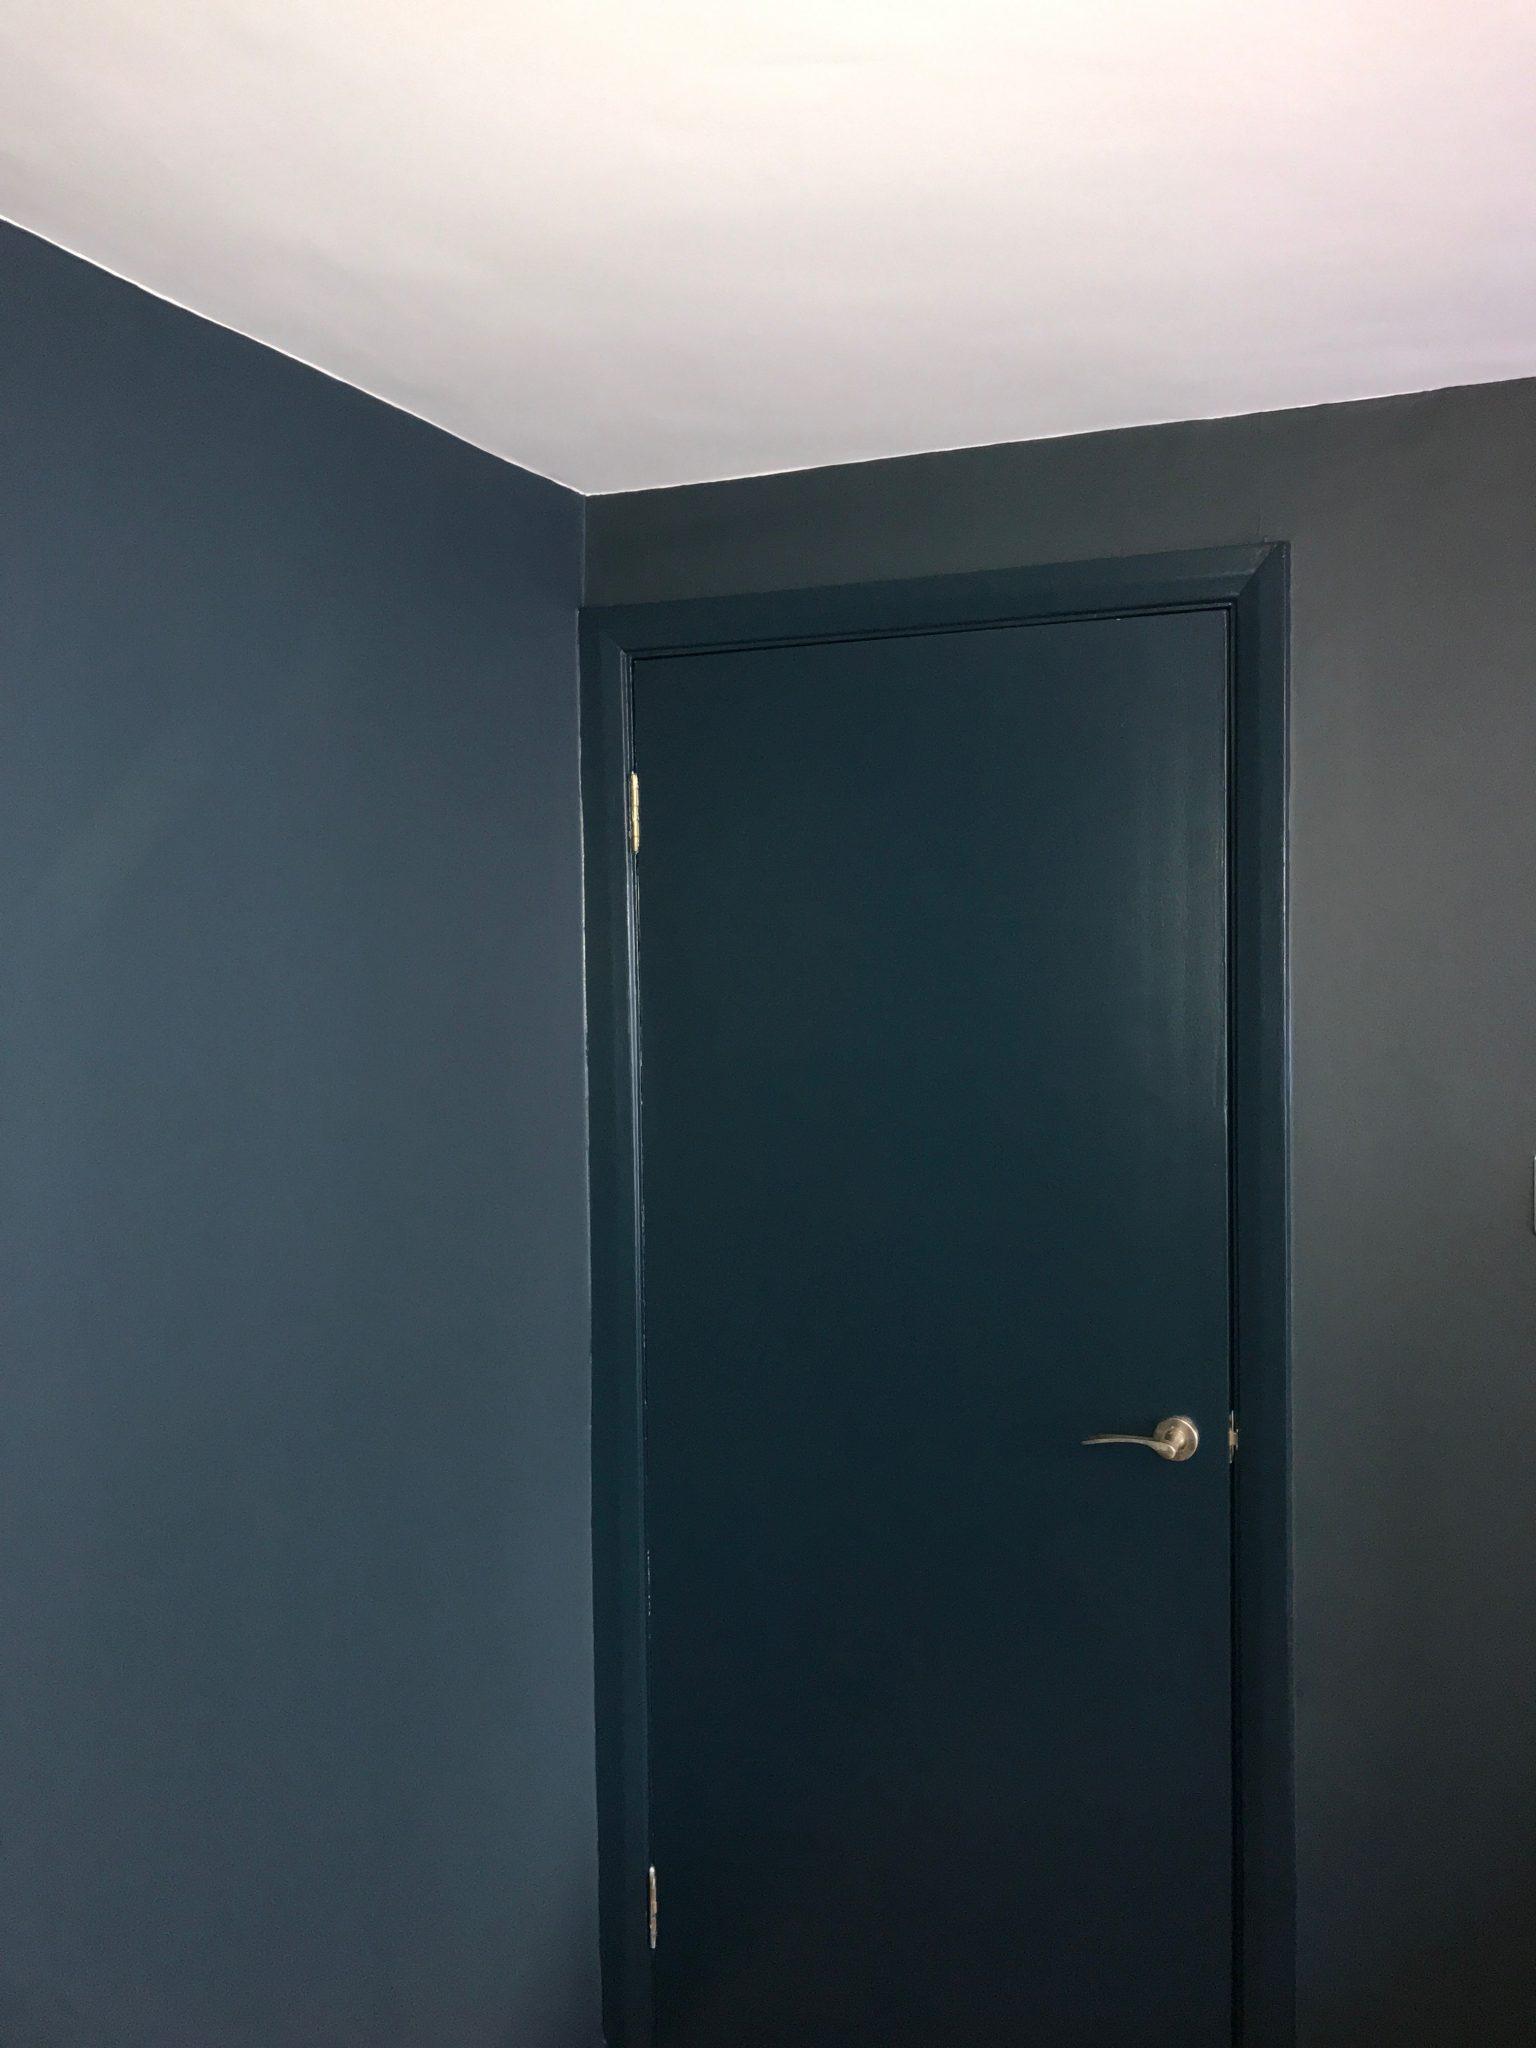 IMG 2371 - Painting & Decorating